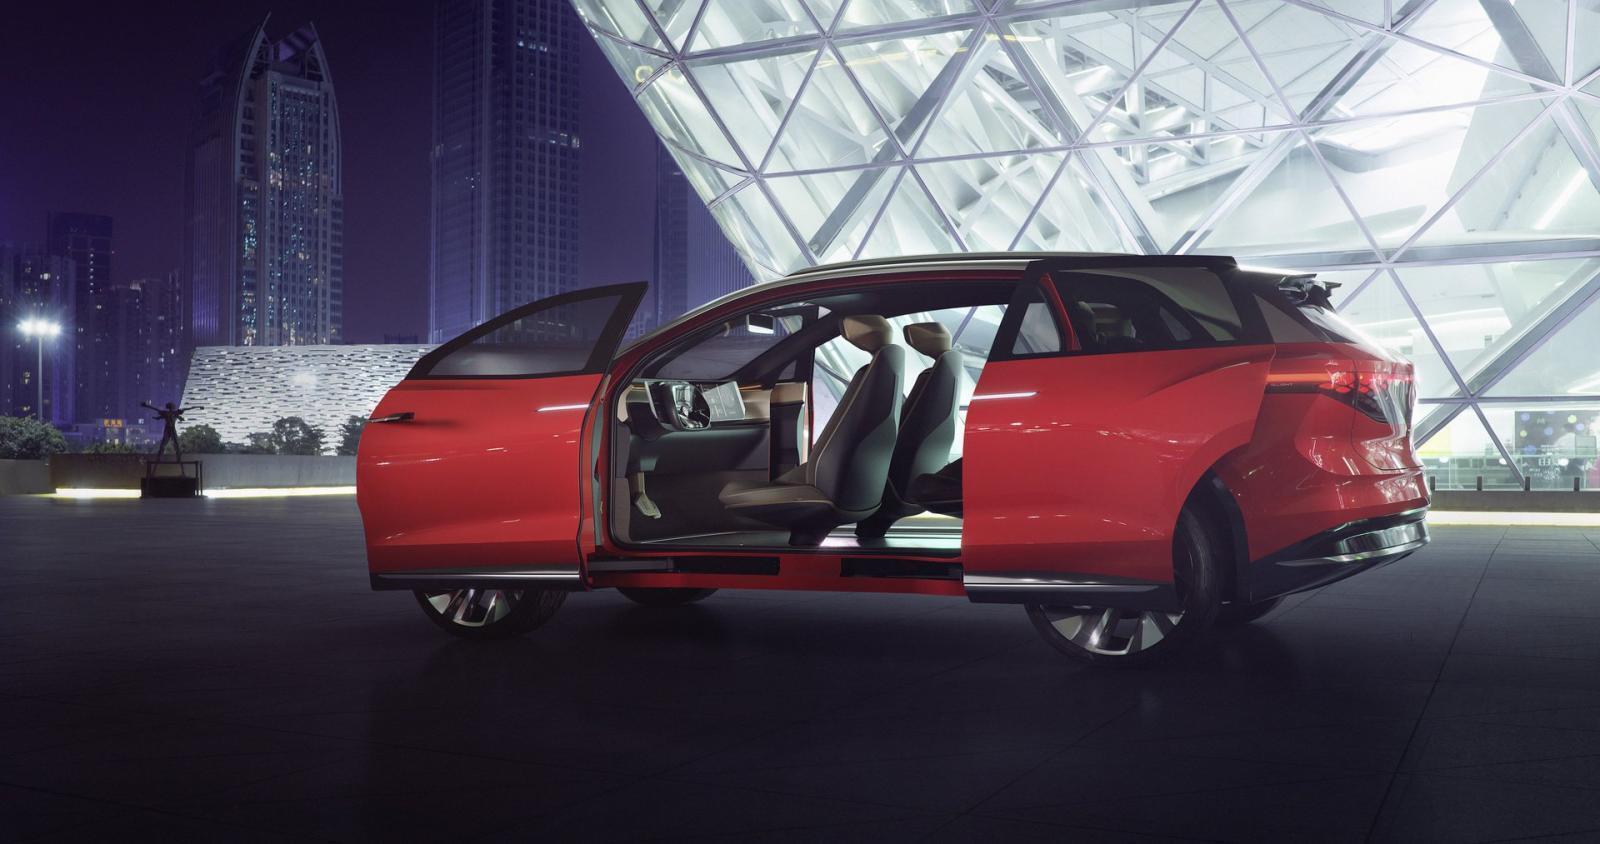 volkswagen-id-roomzz-concept-suv-dien-co-cu-li-di-chuyen-450-km-va-lap-dat-3-hang-ghe-duoc-ra-mat-2.jpg